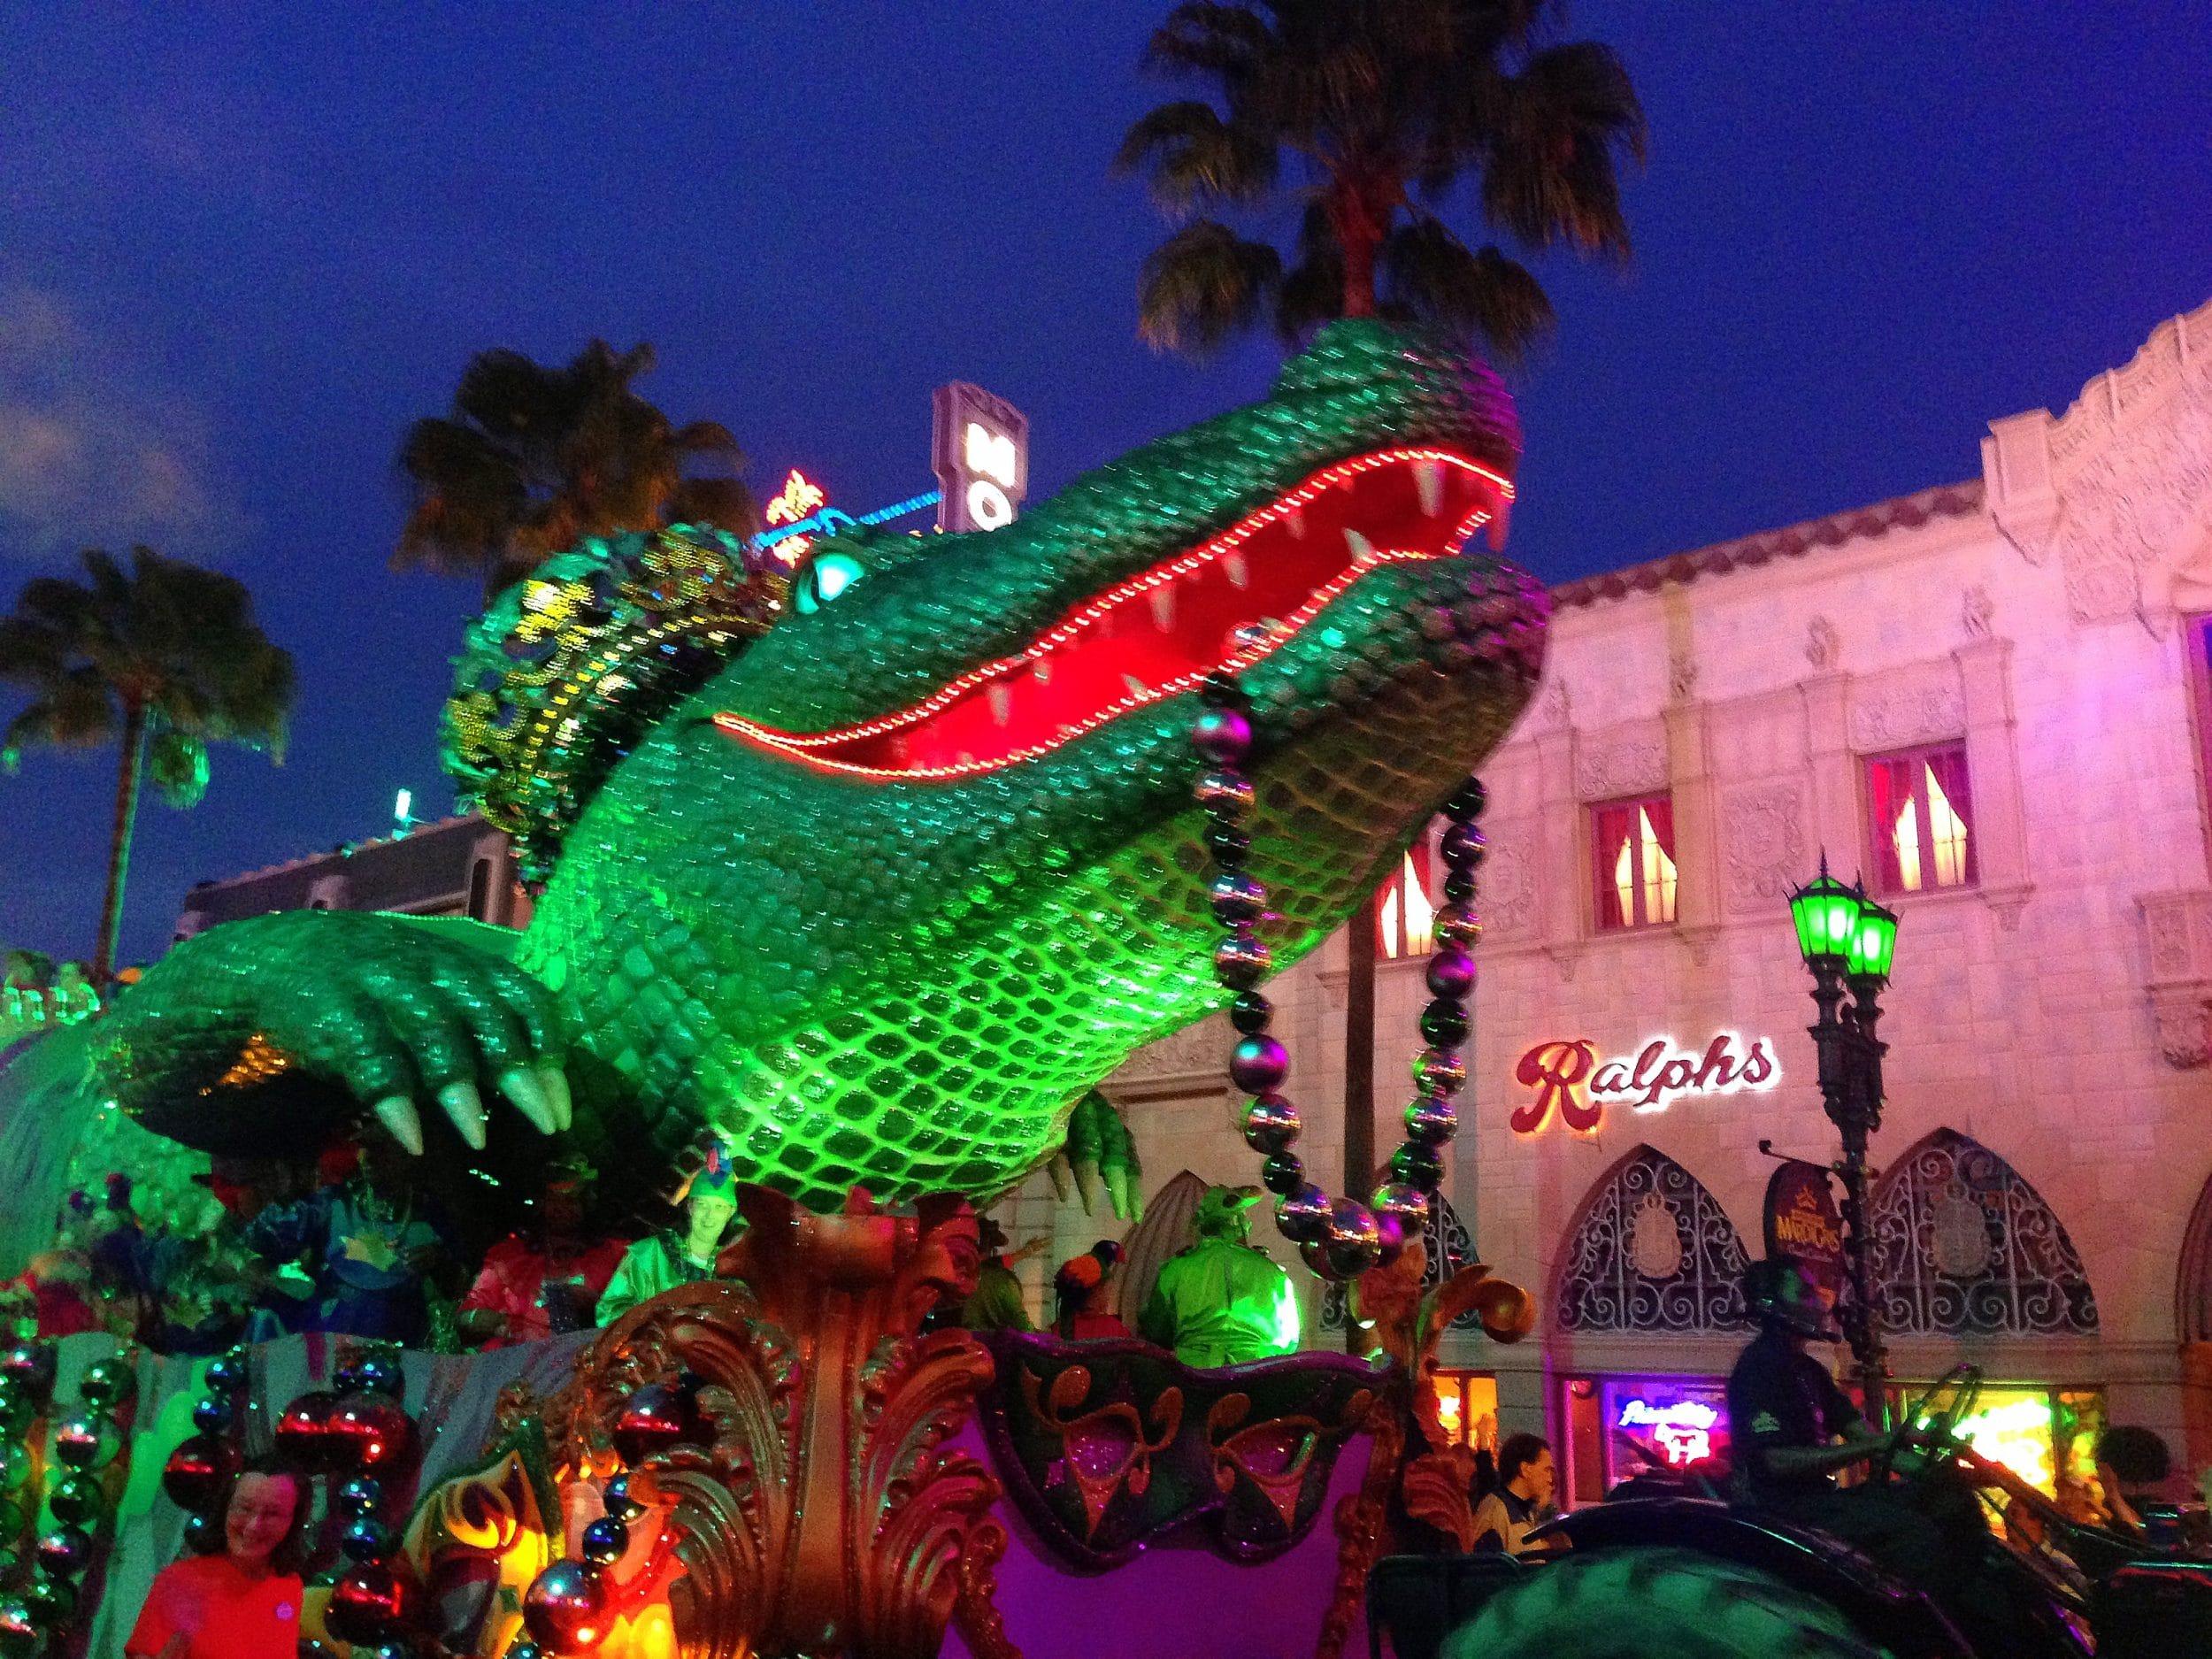 Universal Studios via Wayfaring With Wagner